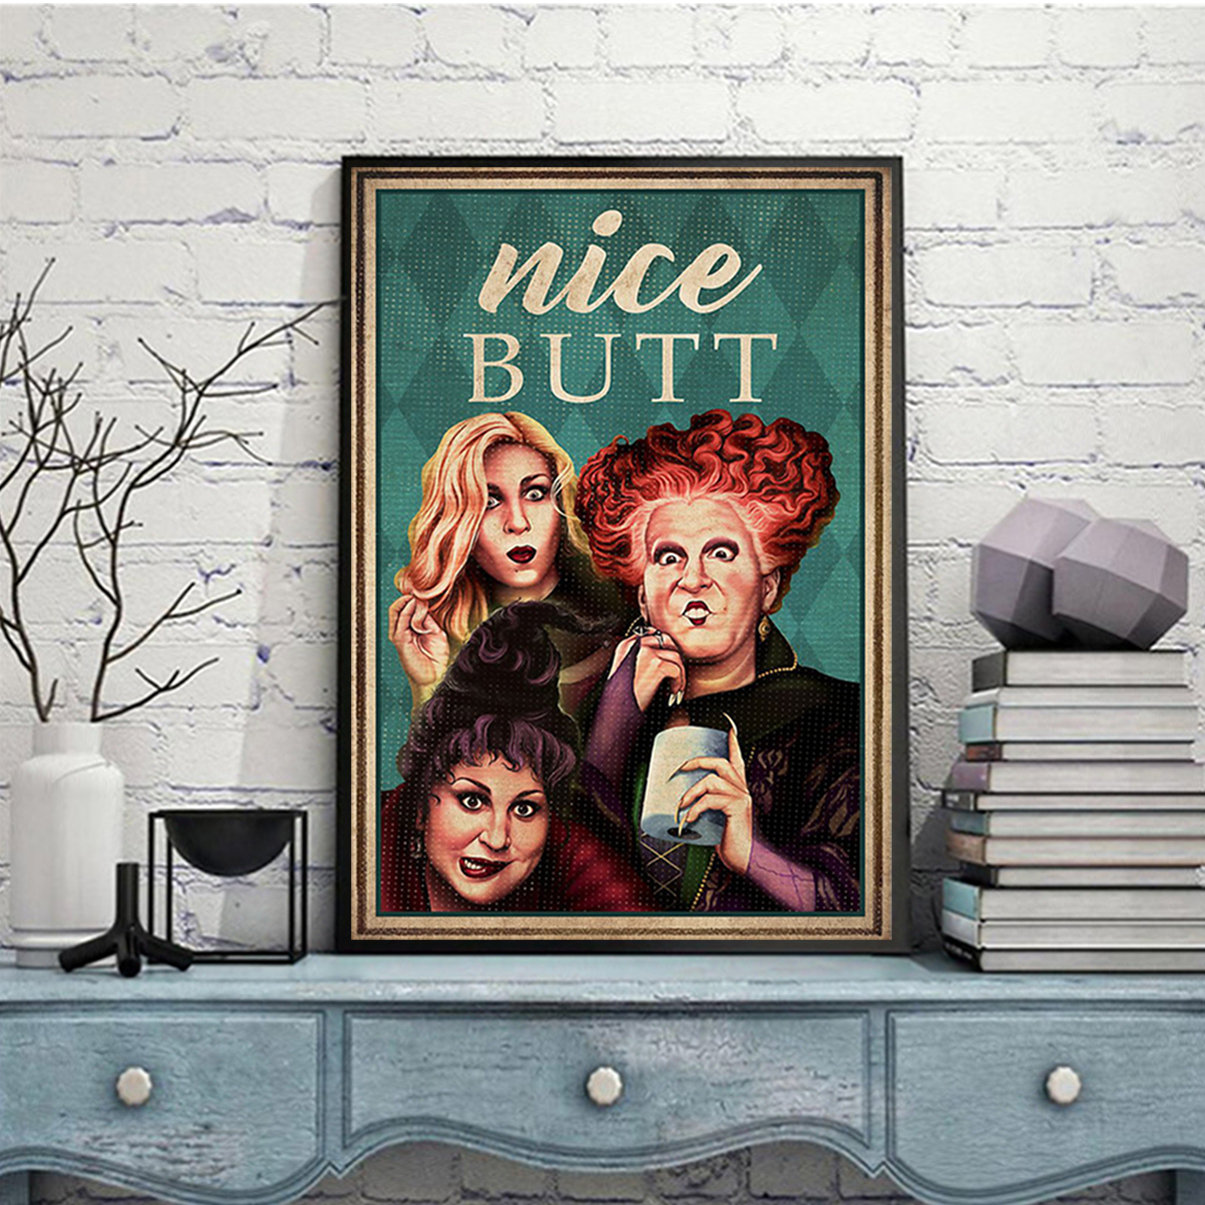 Hocus pocus nice butt poster A2